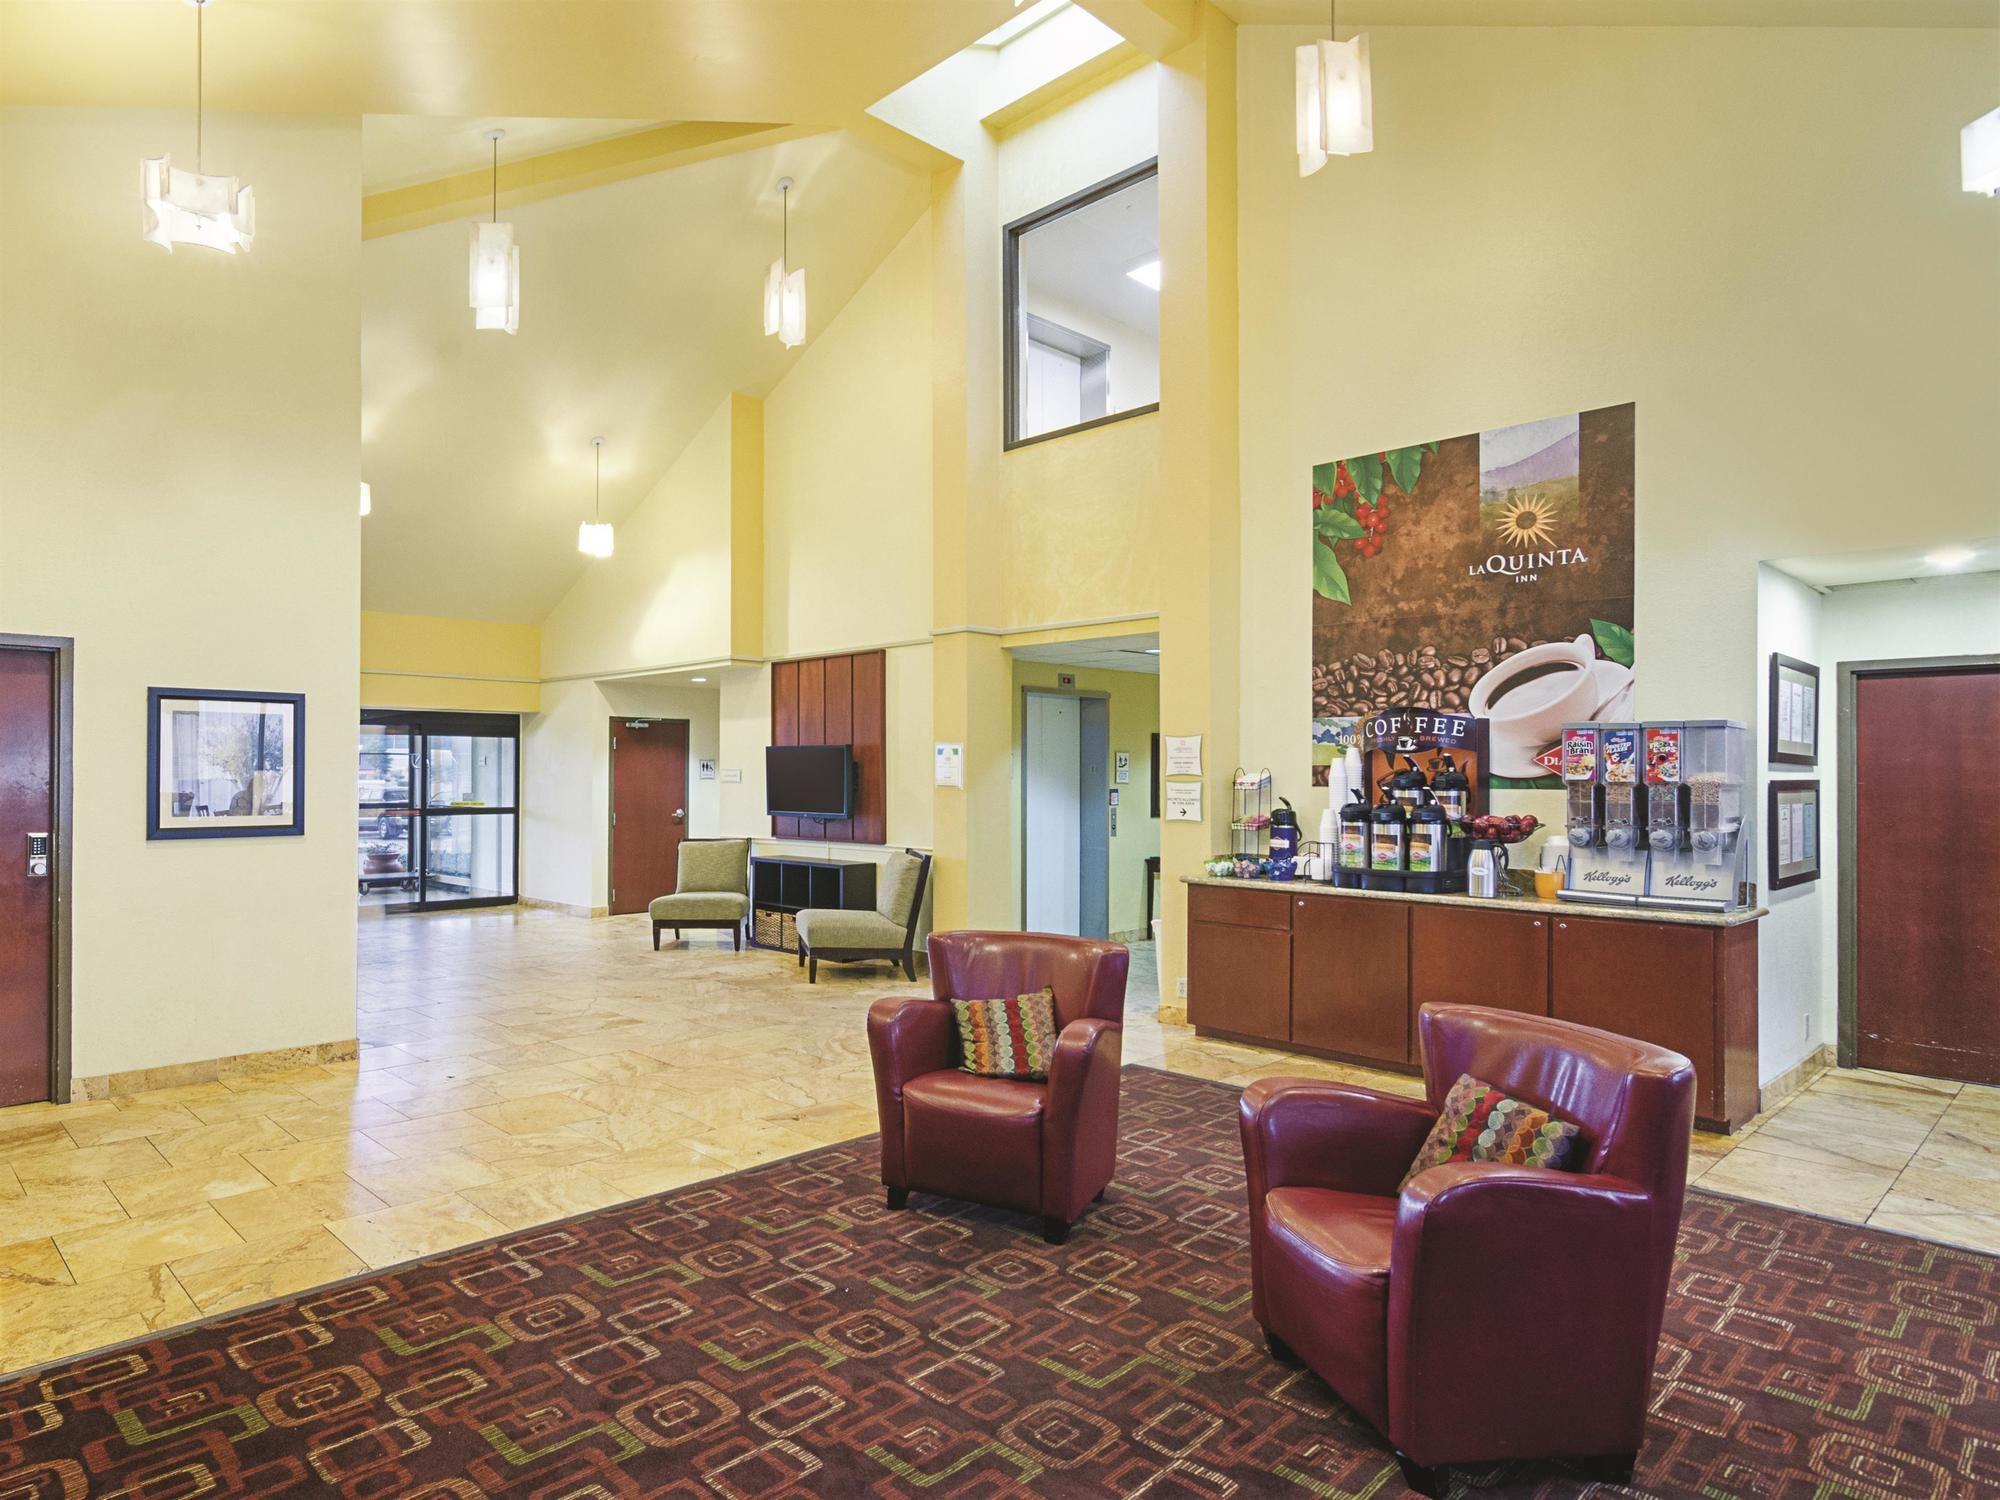 La Quinta Inn & Suites Dothan in Dothan, AL